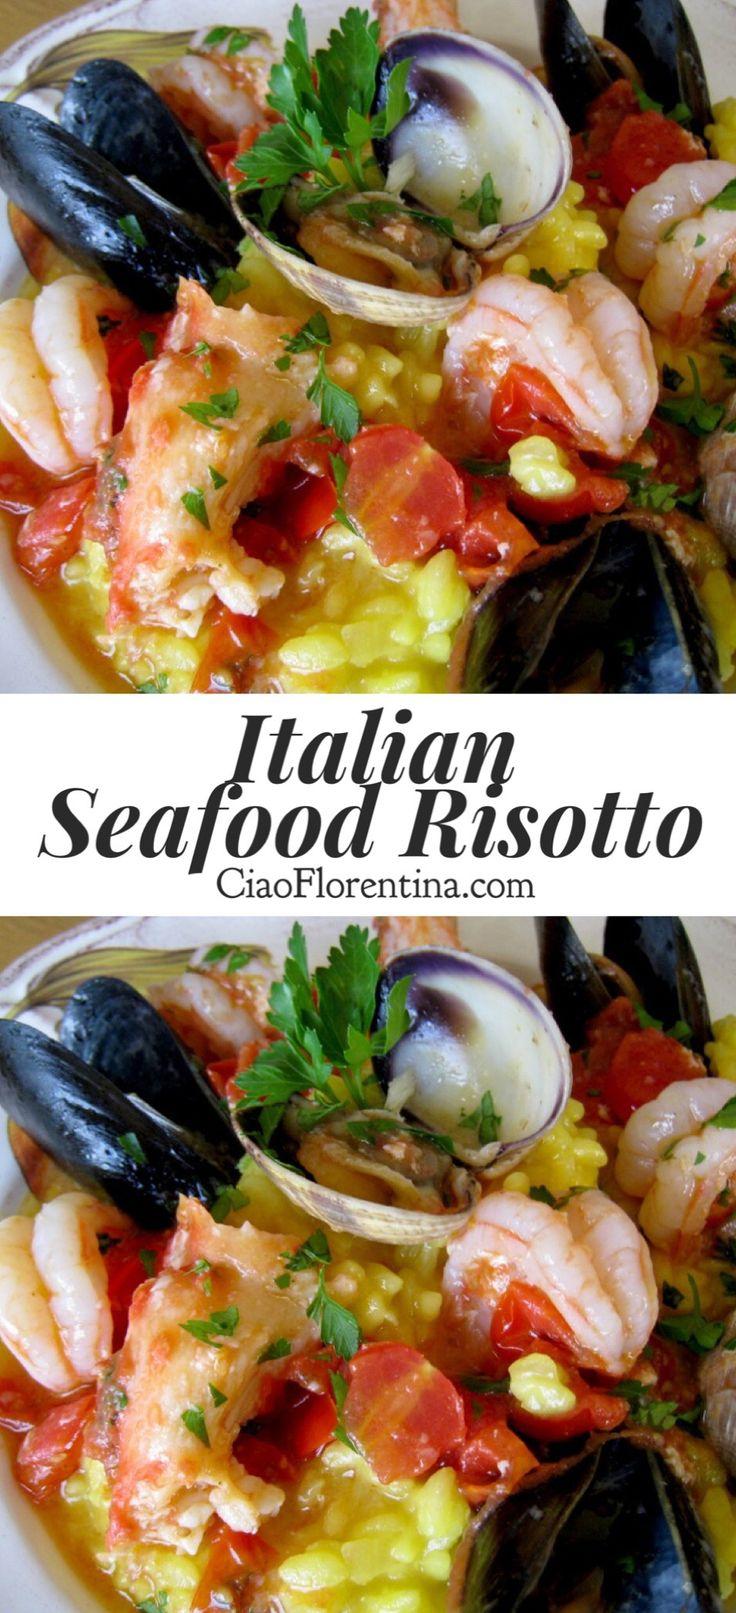 Seafood Risotto Frutti si Mare Recipe with Saffron, Shrimp, Clams and Mussels | CiaoFlorentina.com @CiaoFlorentina